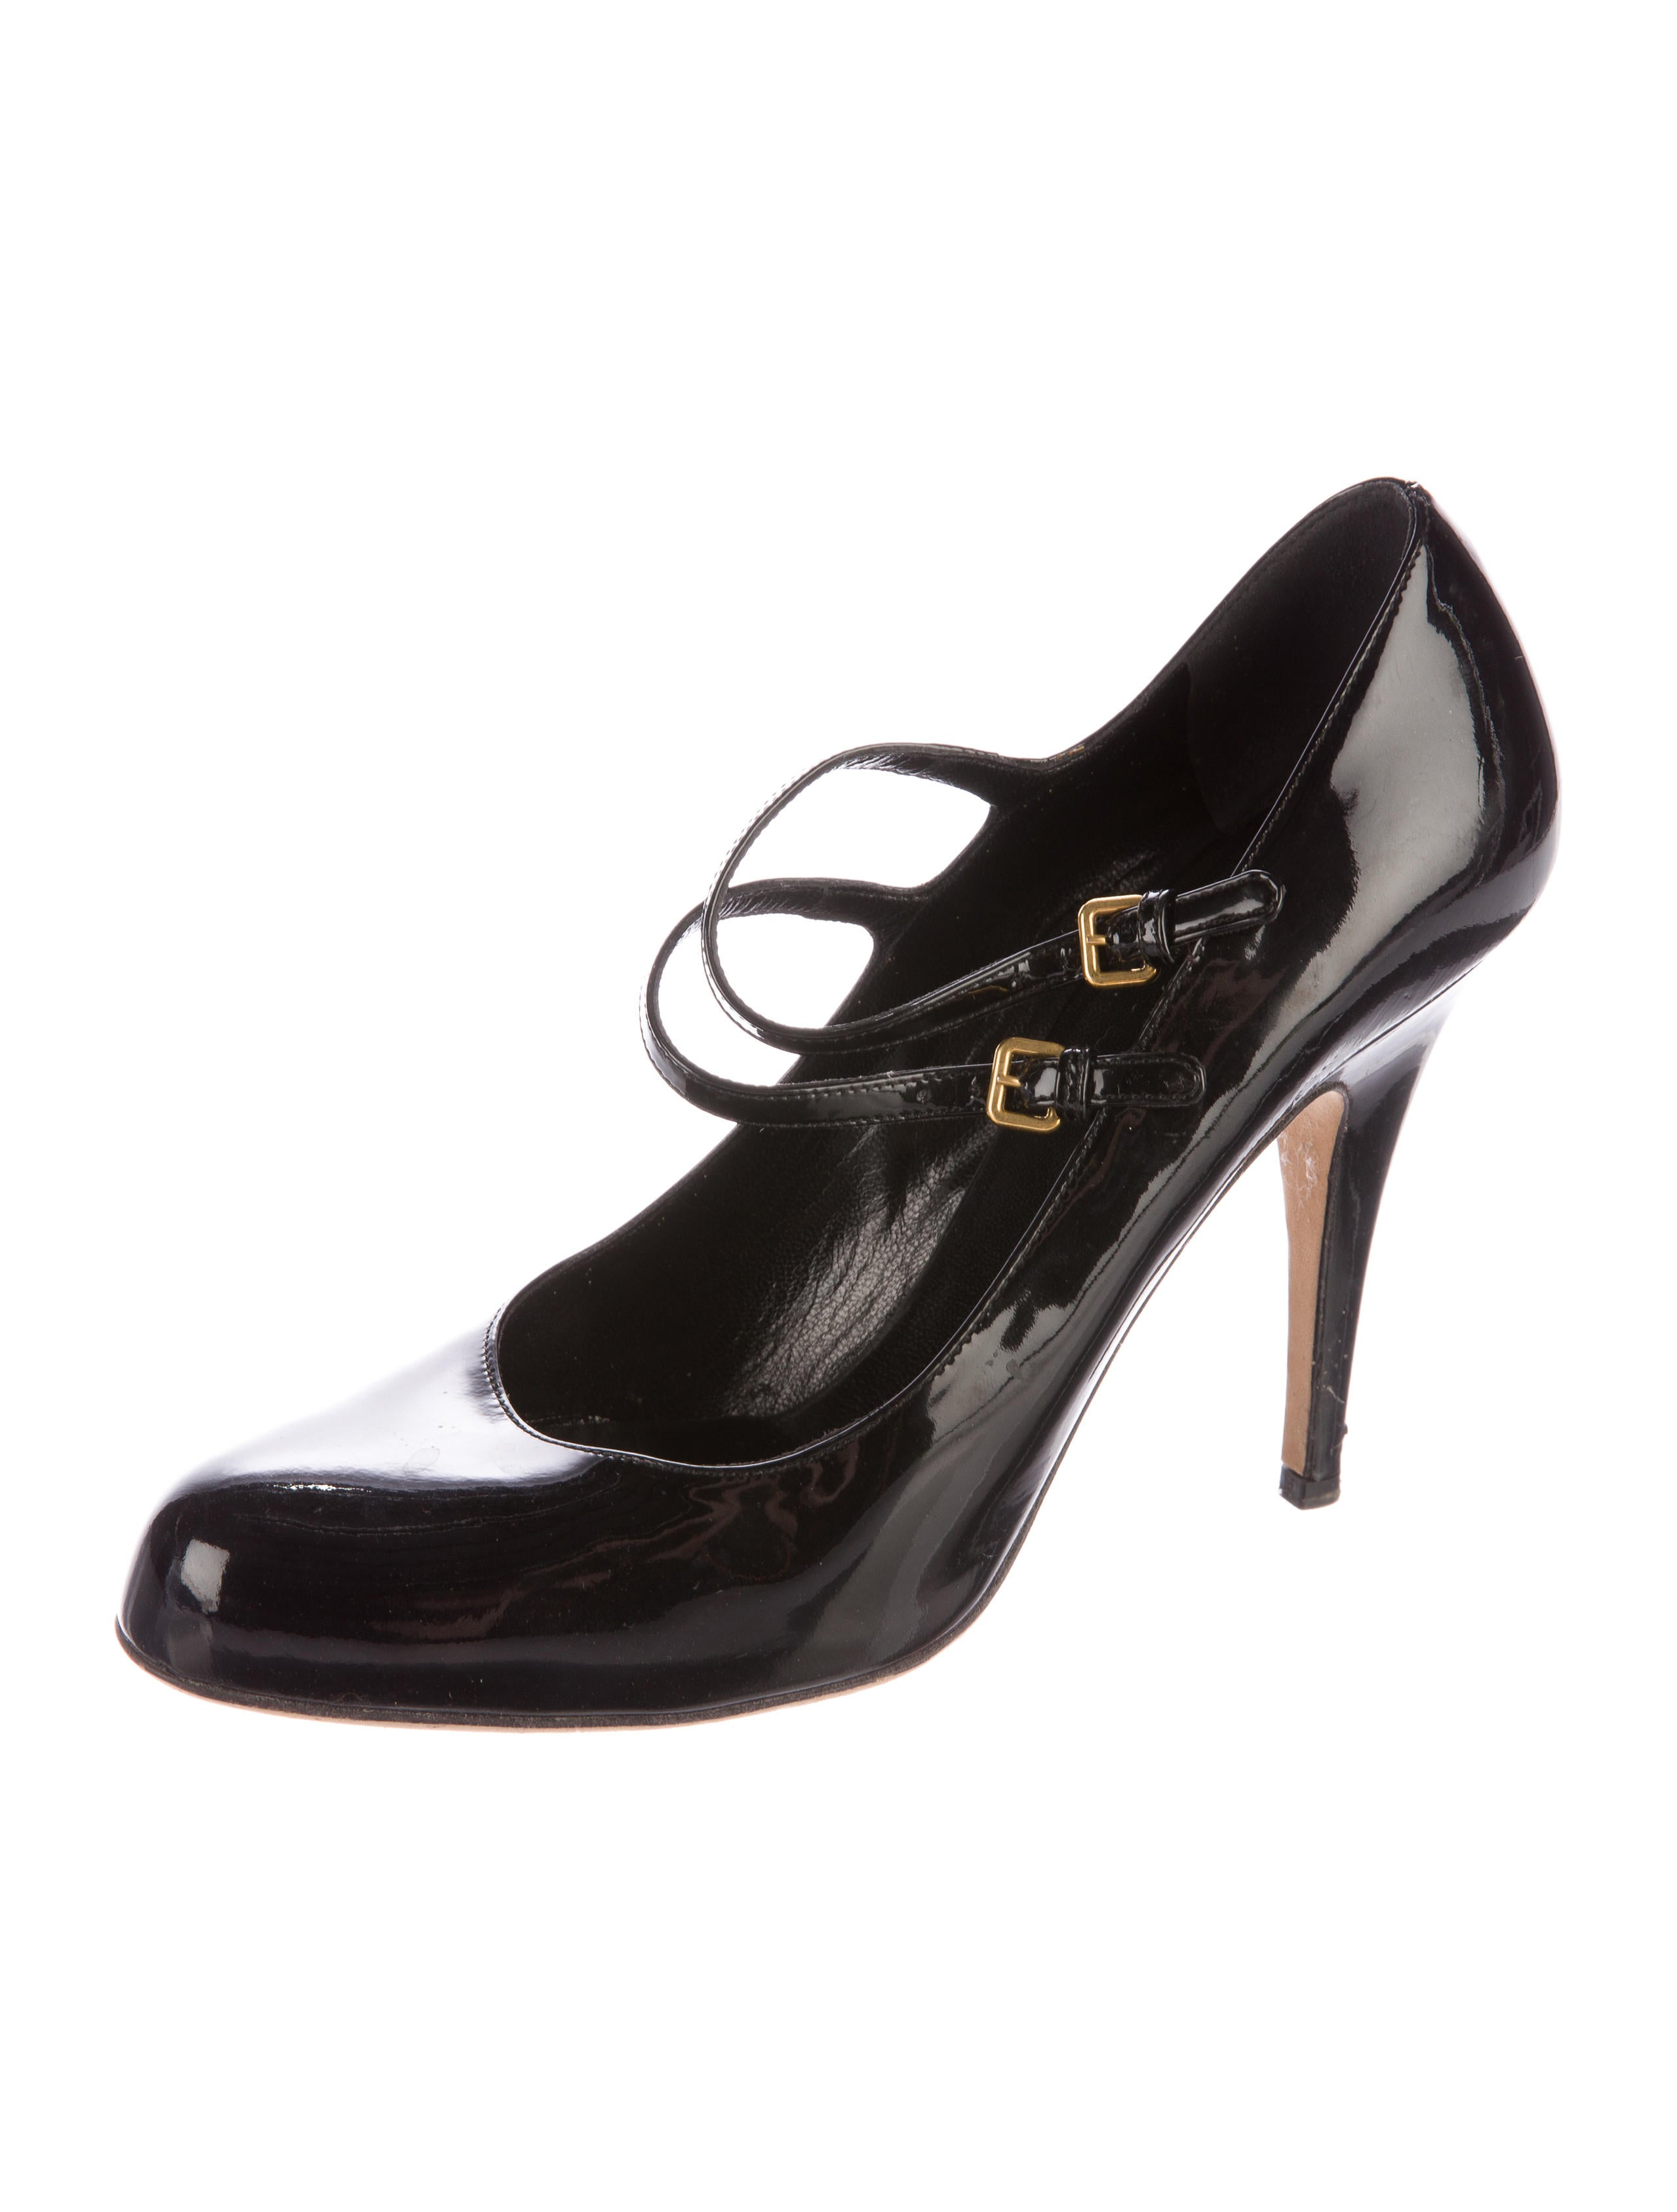 Miu Miu Patent Leather Mary Jane Pumps - Shoes - MIU51399   The RealReal